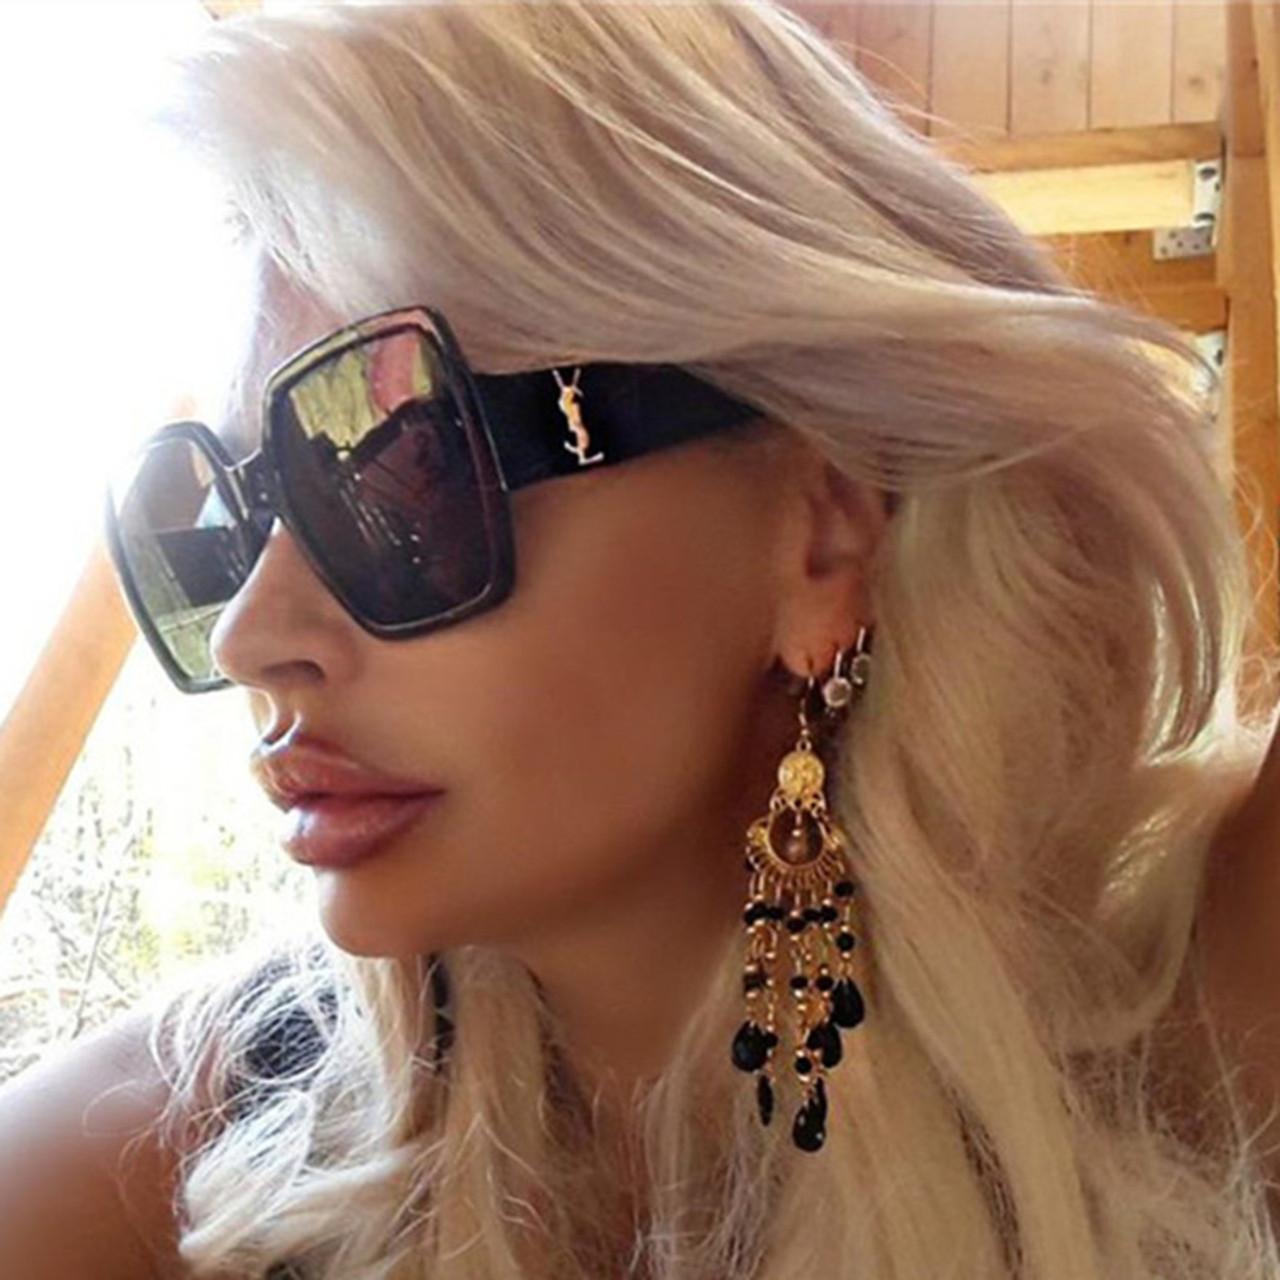 1762fcabd ... Oversized Sunglasses Women Big Frame Square Sun Glasses Men Brand  Designer 2019 New Vintage Gradient Shades ...